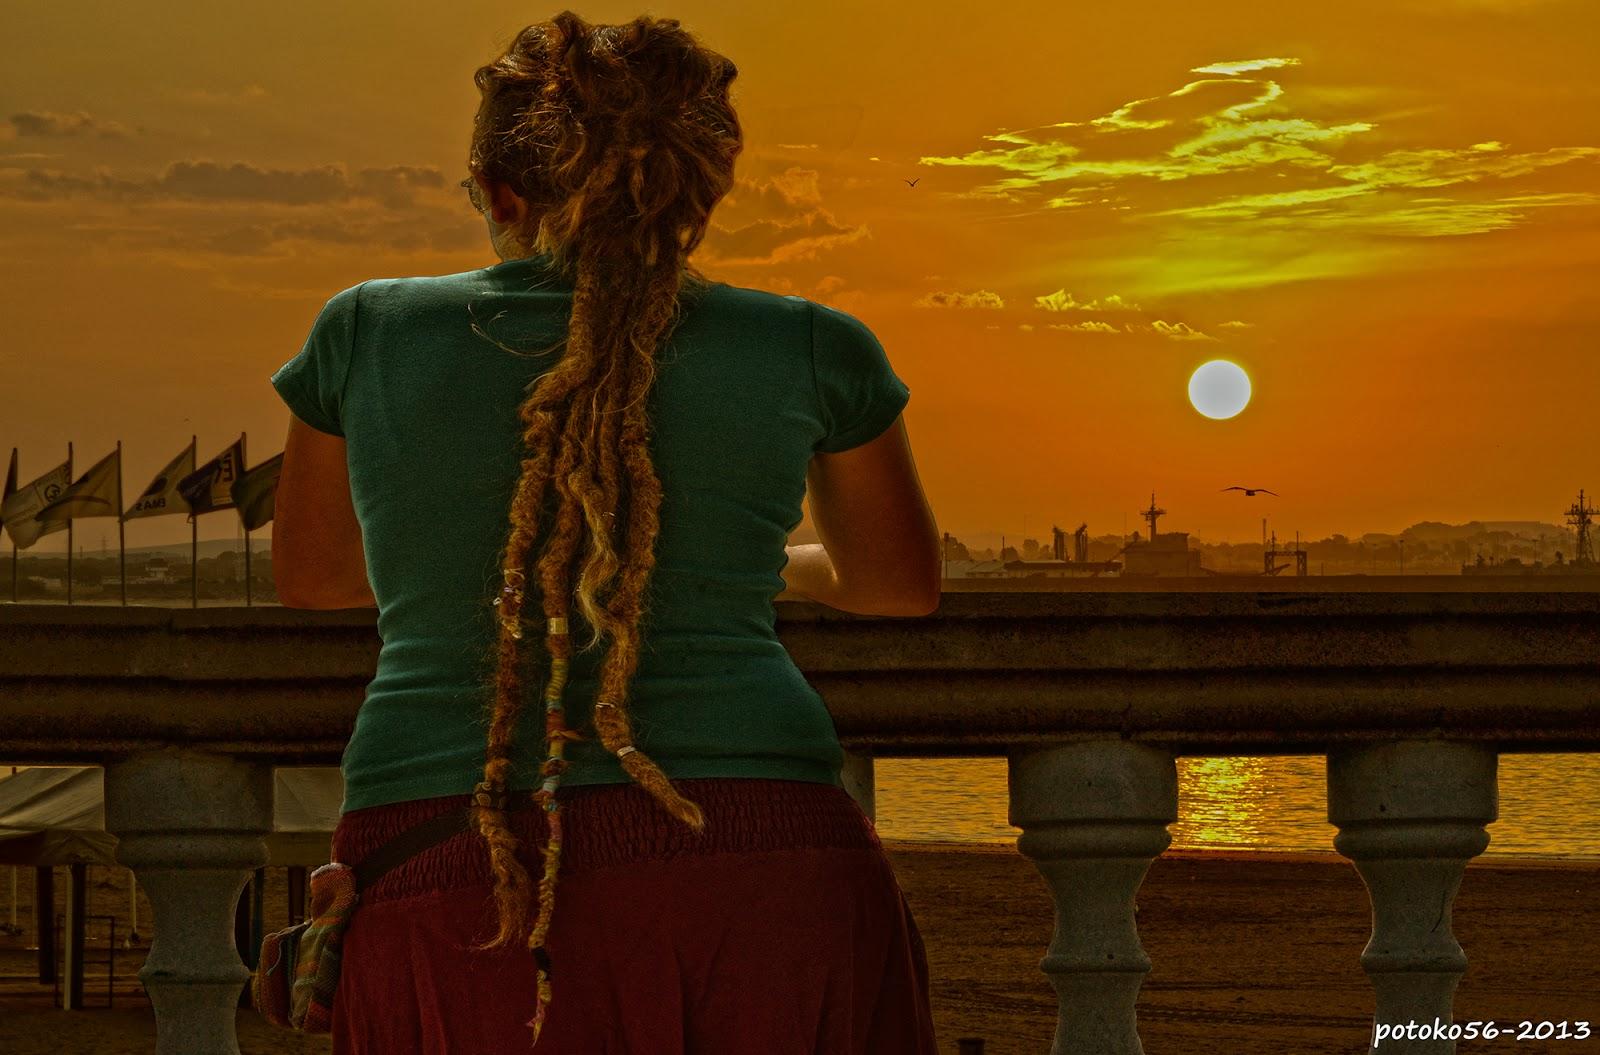 Chica mirando amanecer en Rota